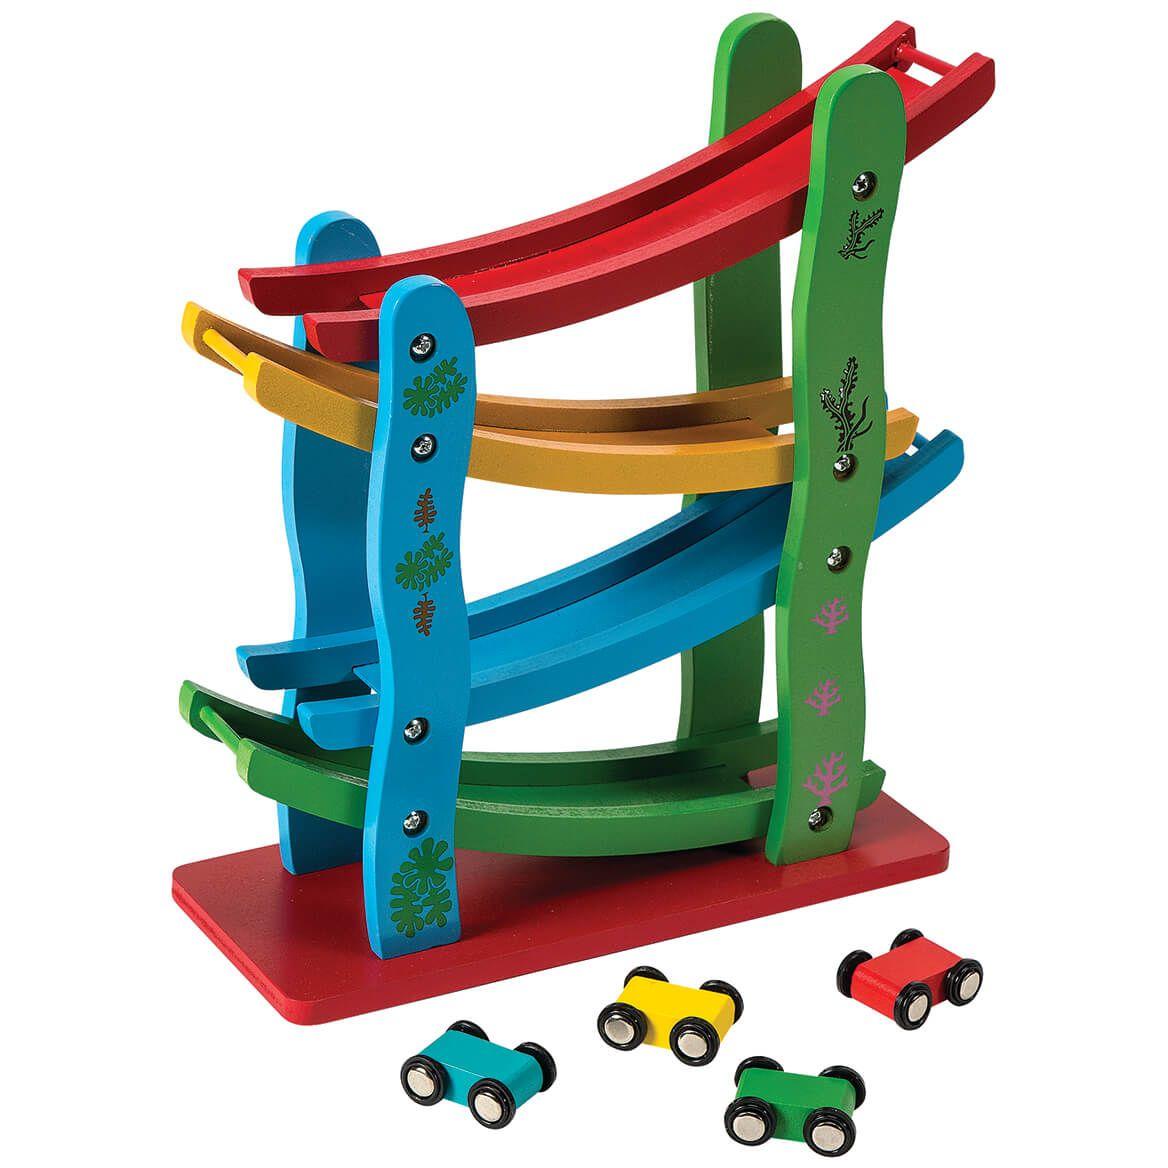 Miniature Wood Car Track-372169